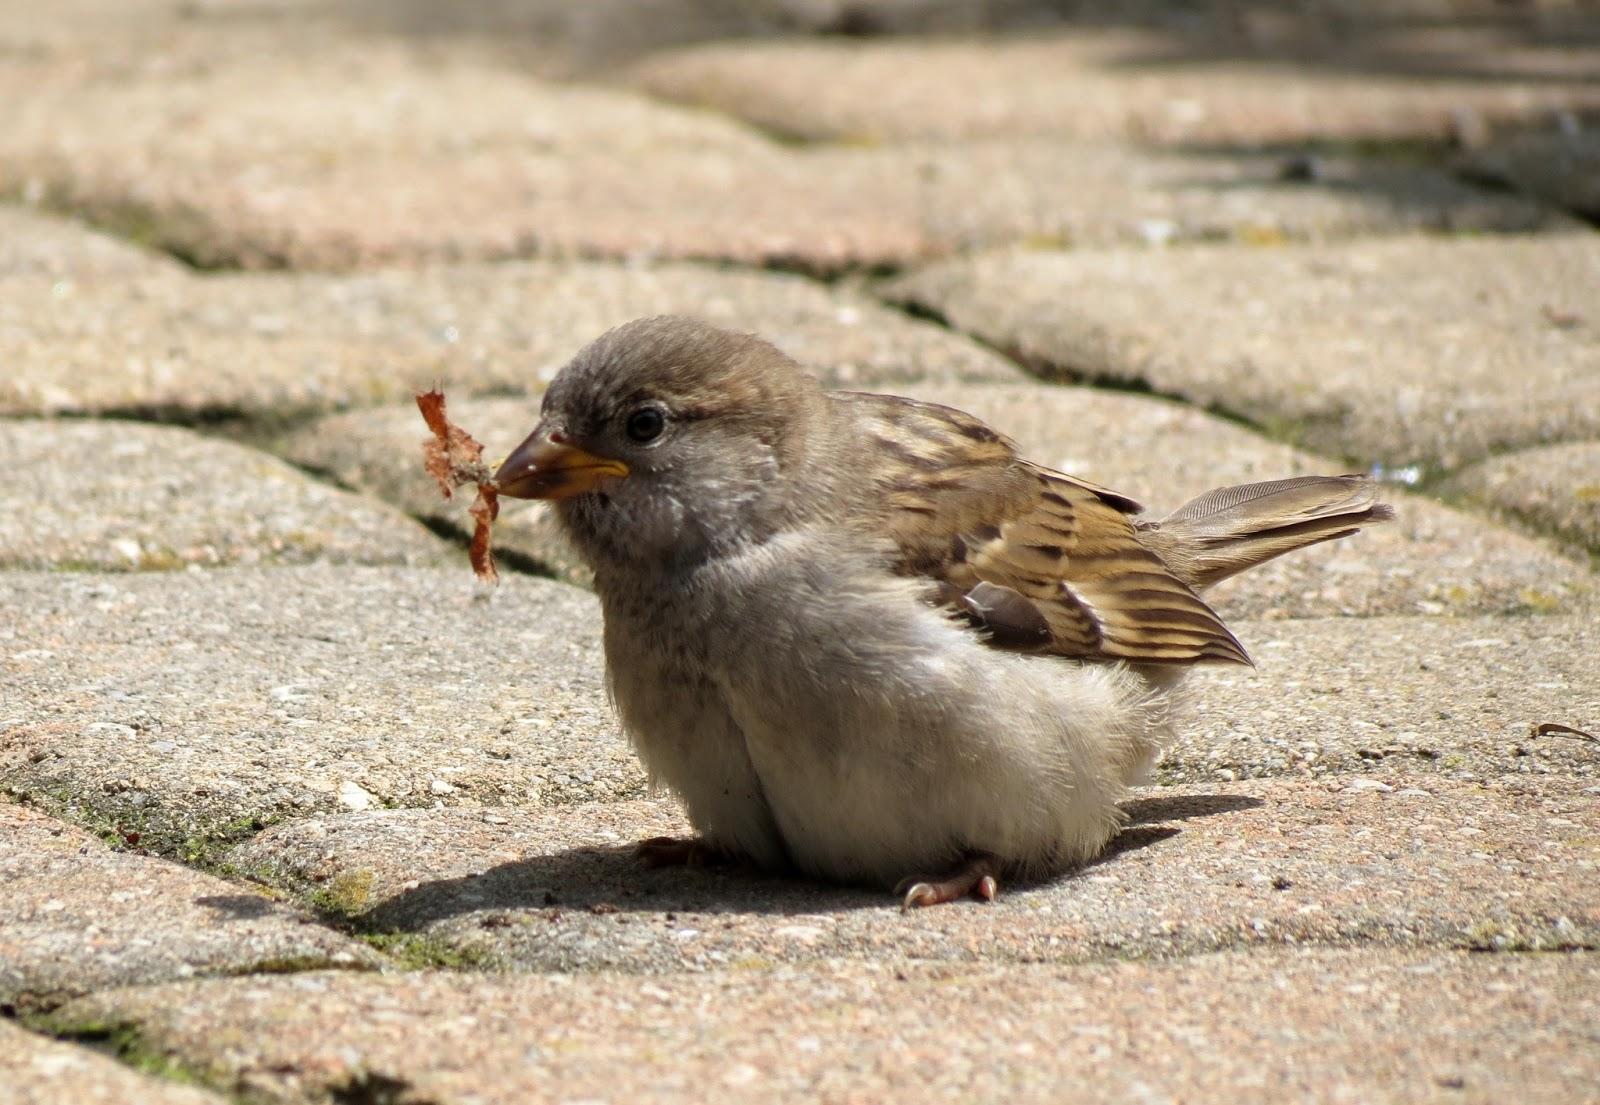 fledgling grackle - photo #30